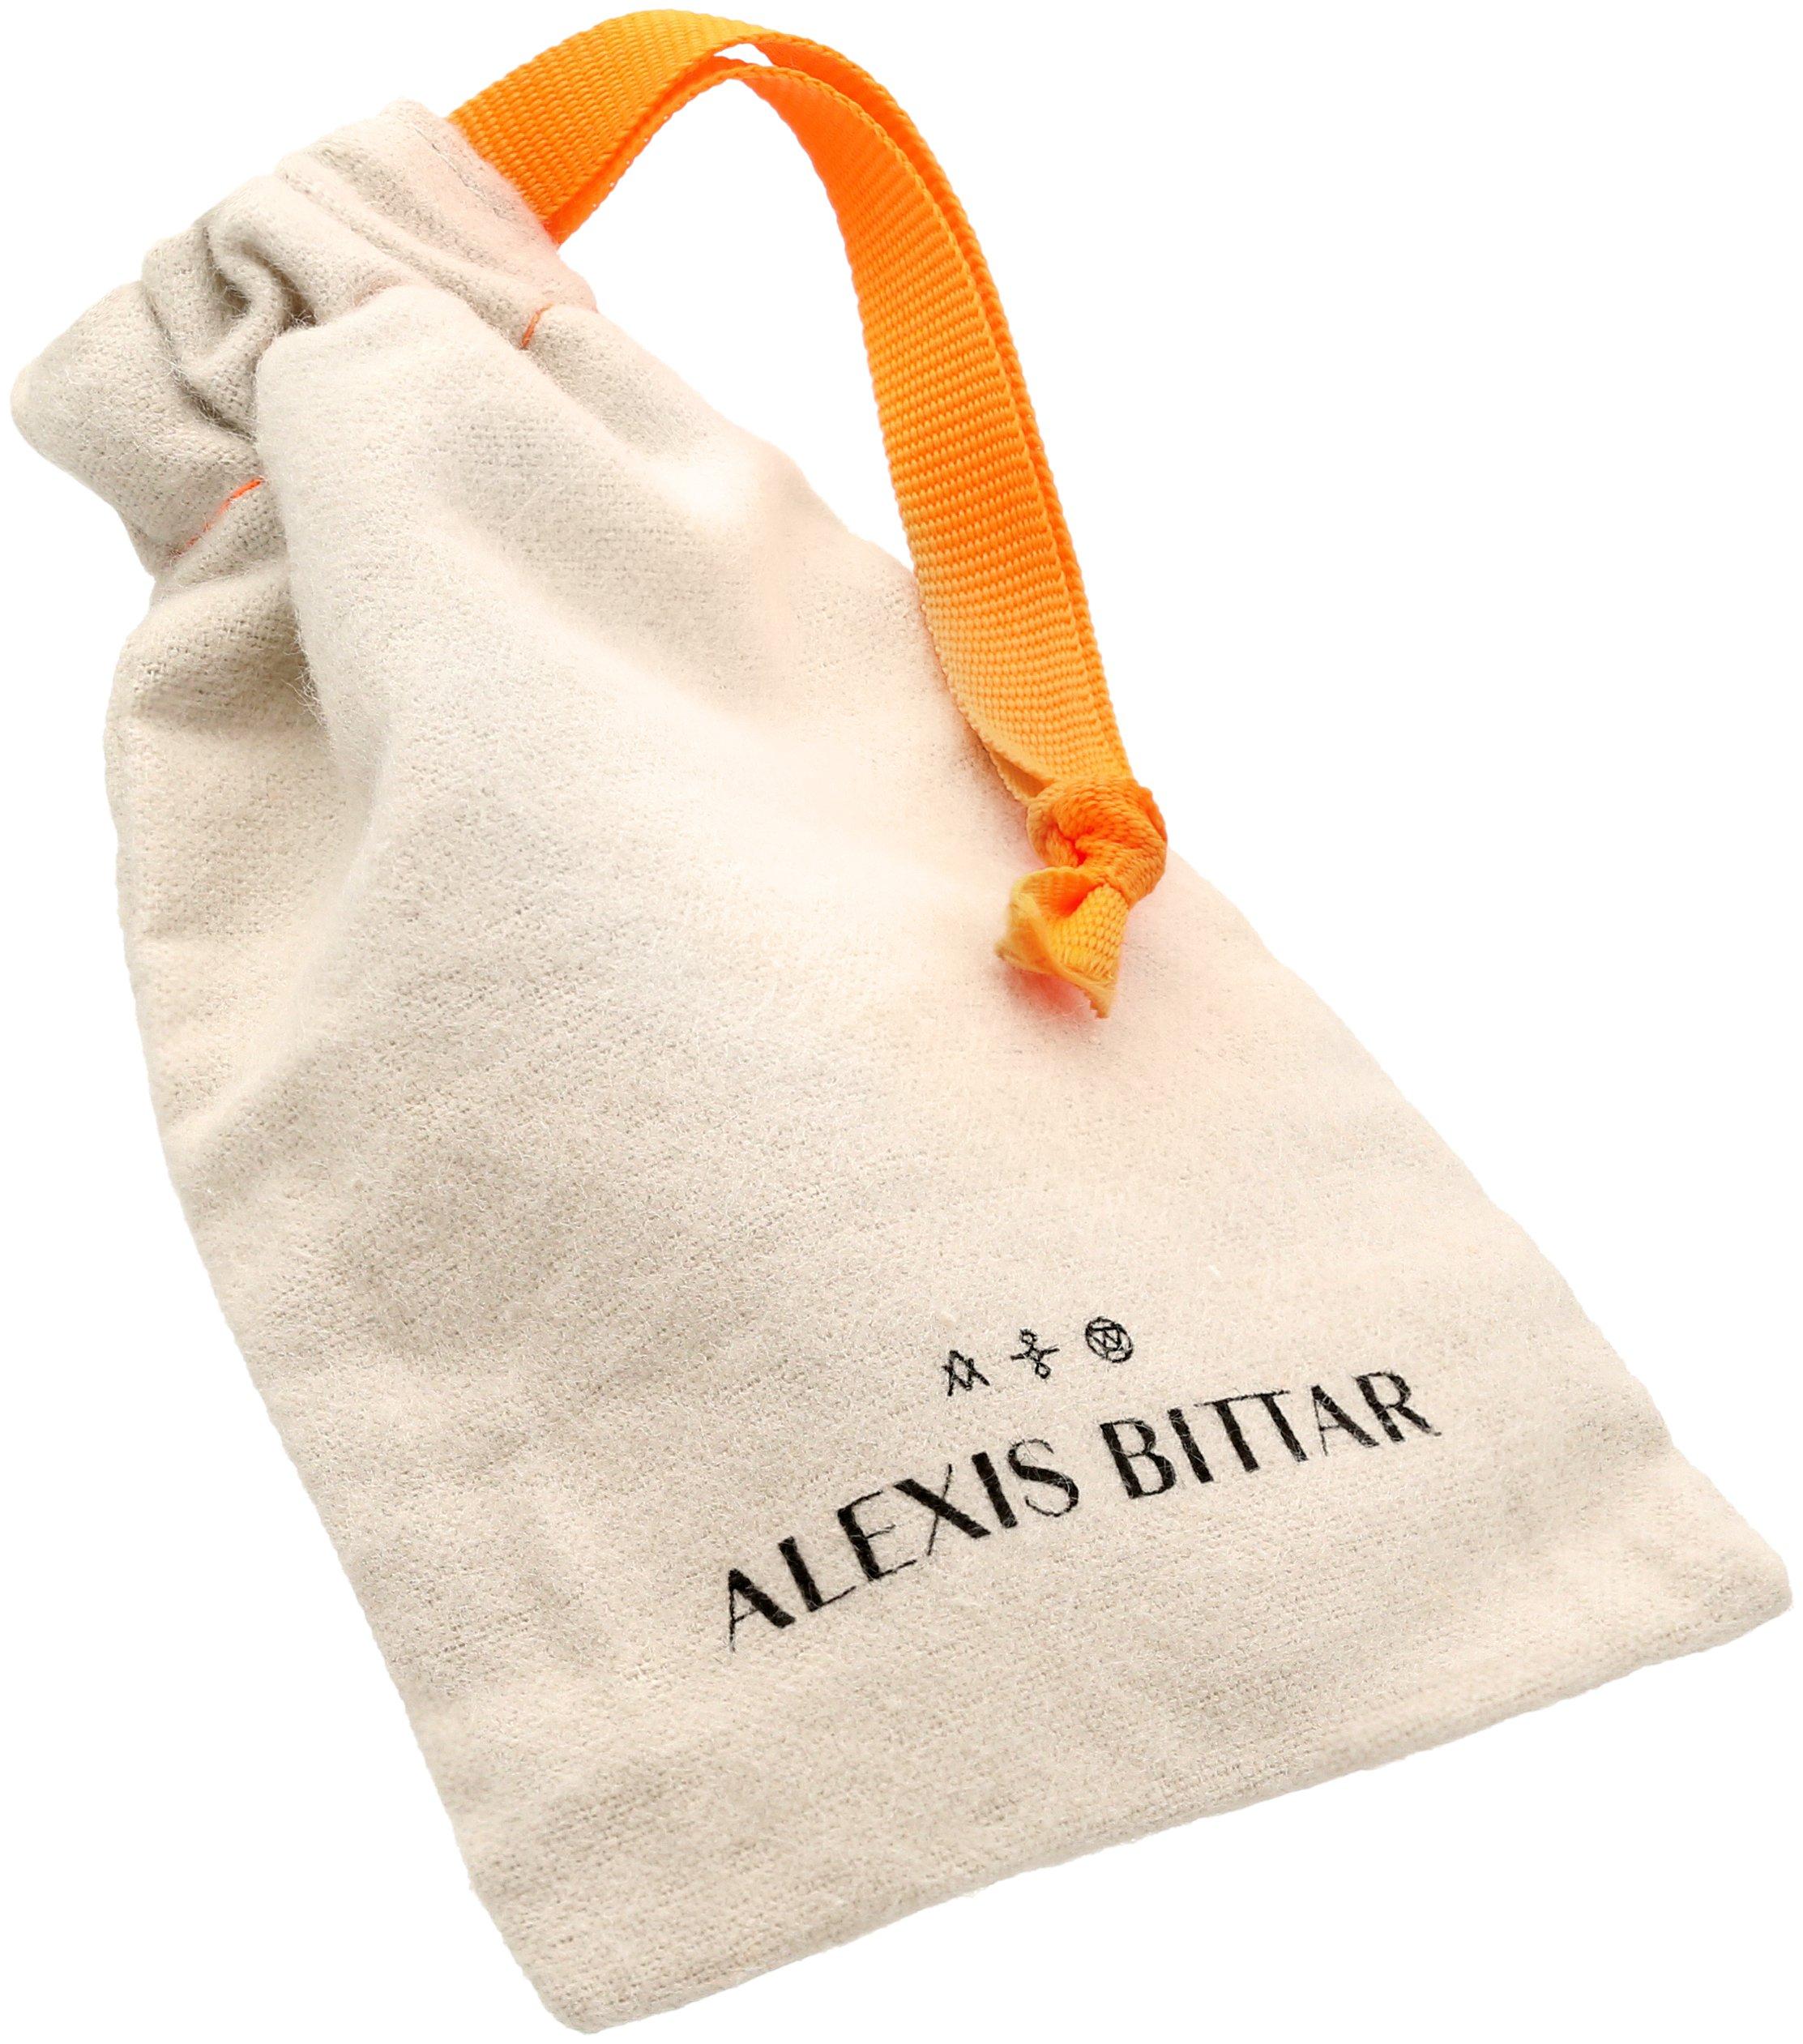 Alexis Bittar Soft Square Cuff Bracelet Bangle, New Labradorite, One Size by Alexis Bittar (Image #3)